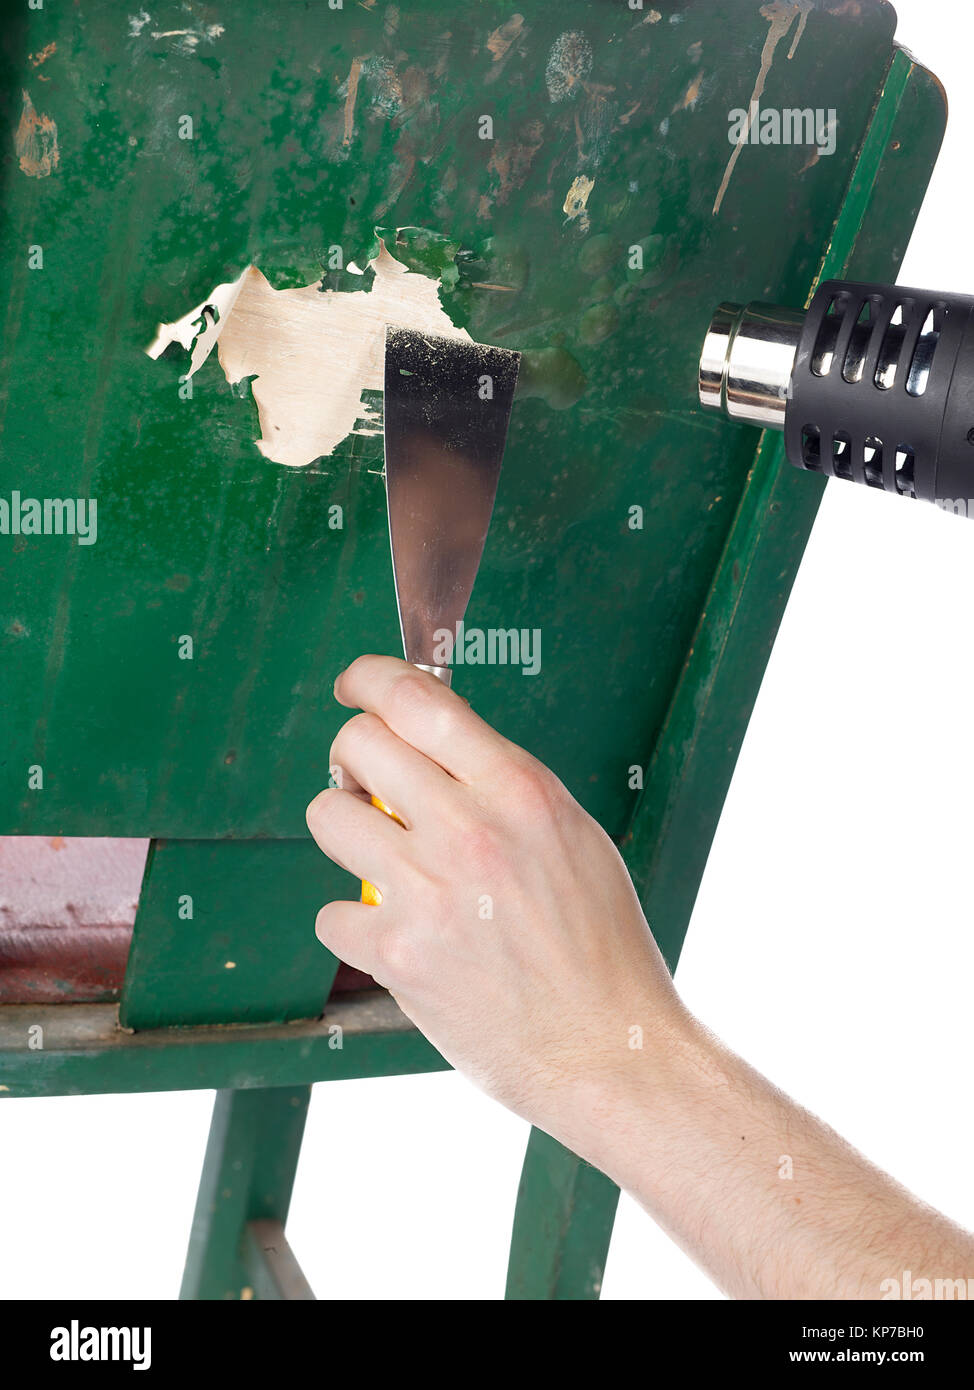 Removing Pax Paint